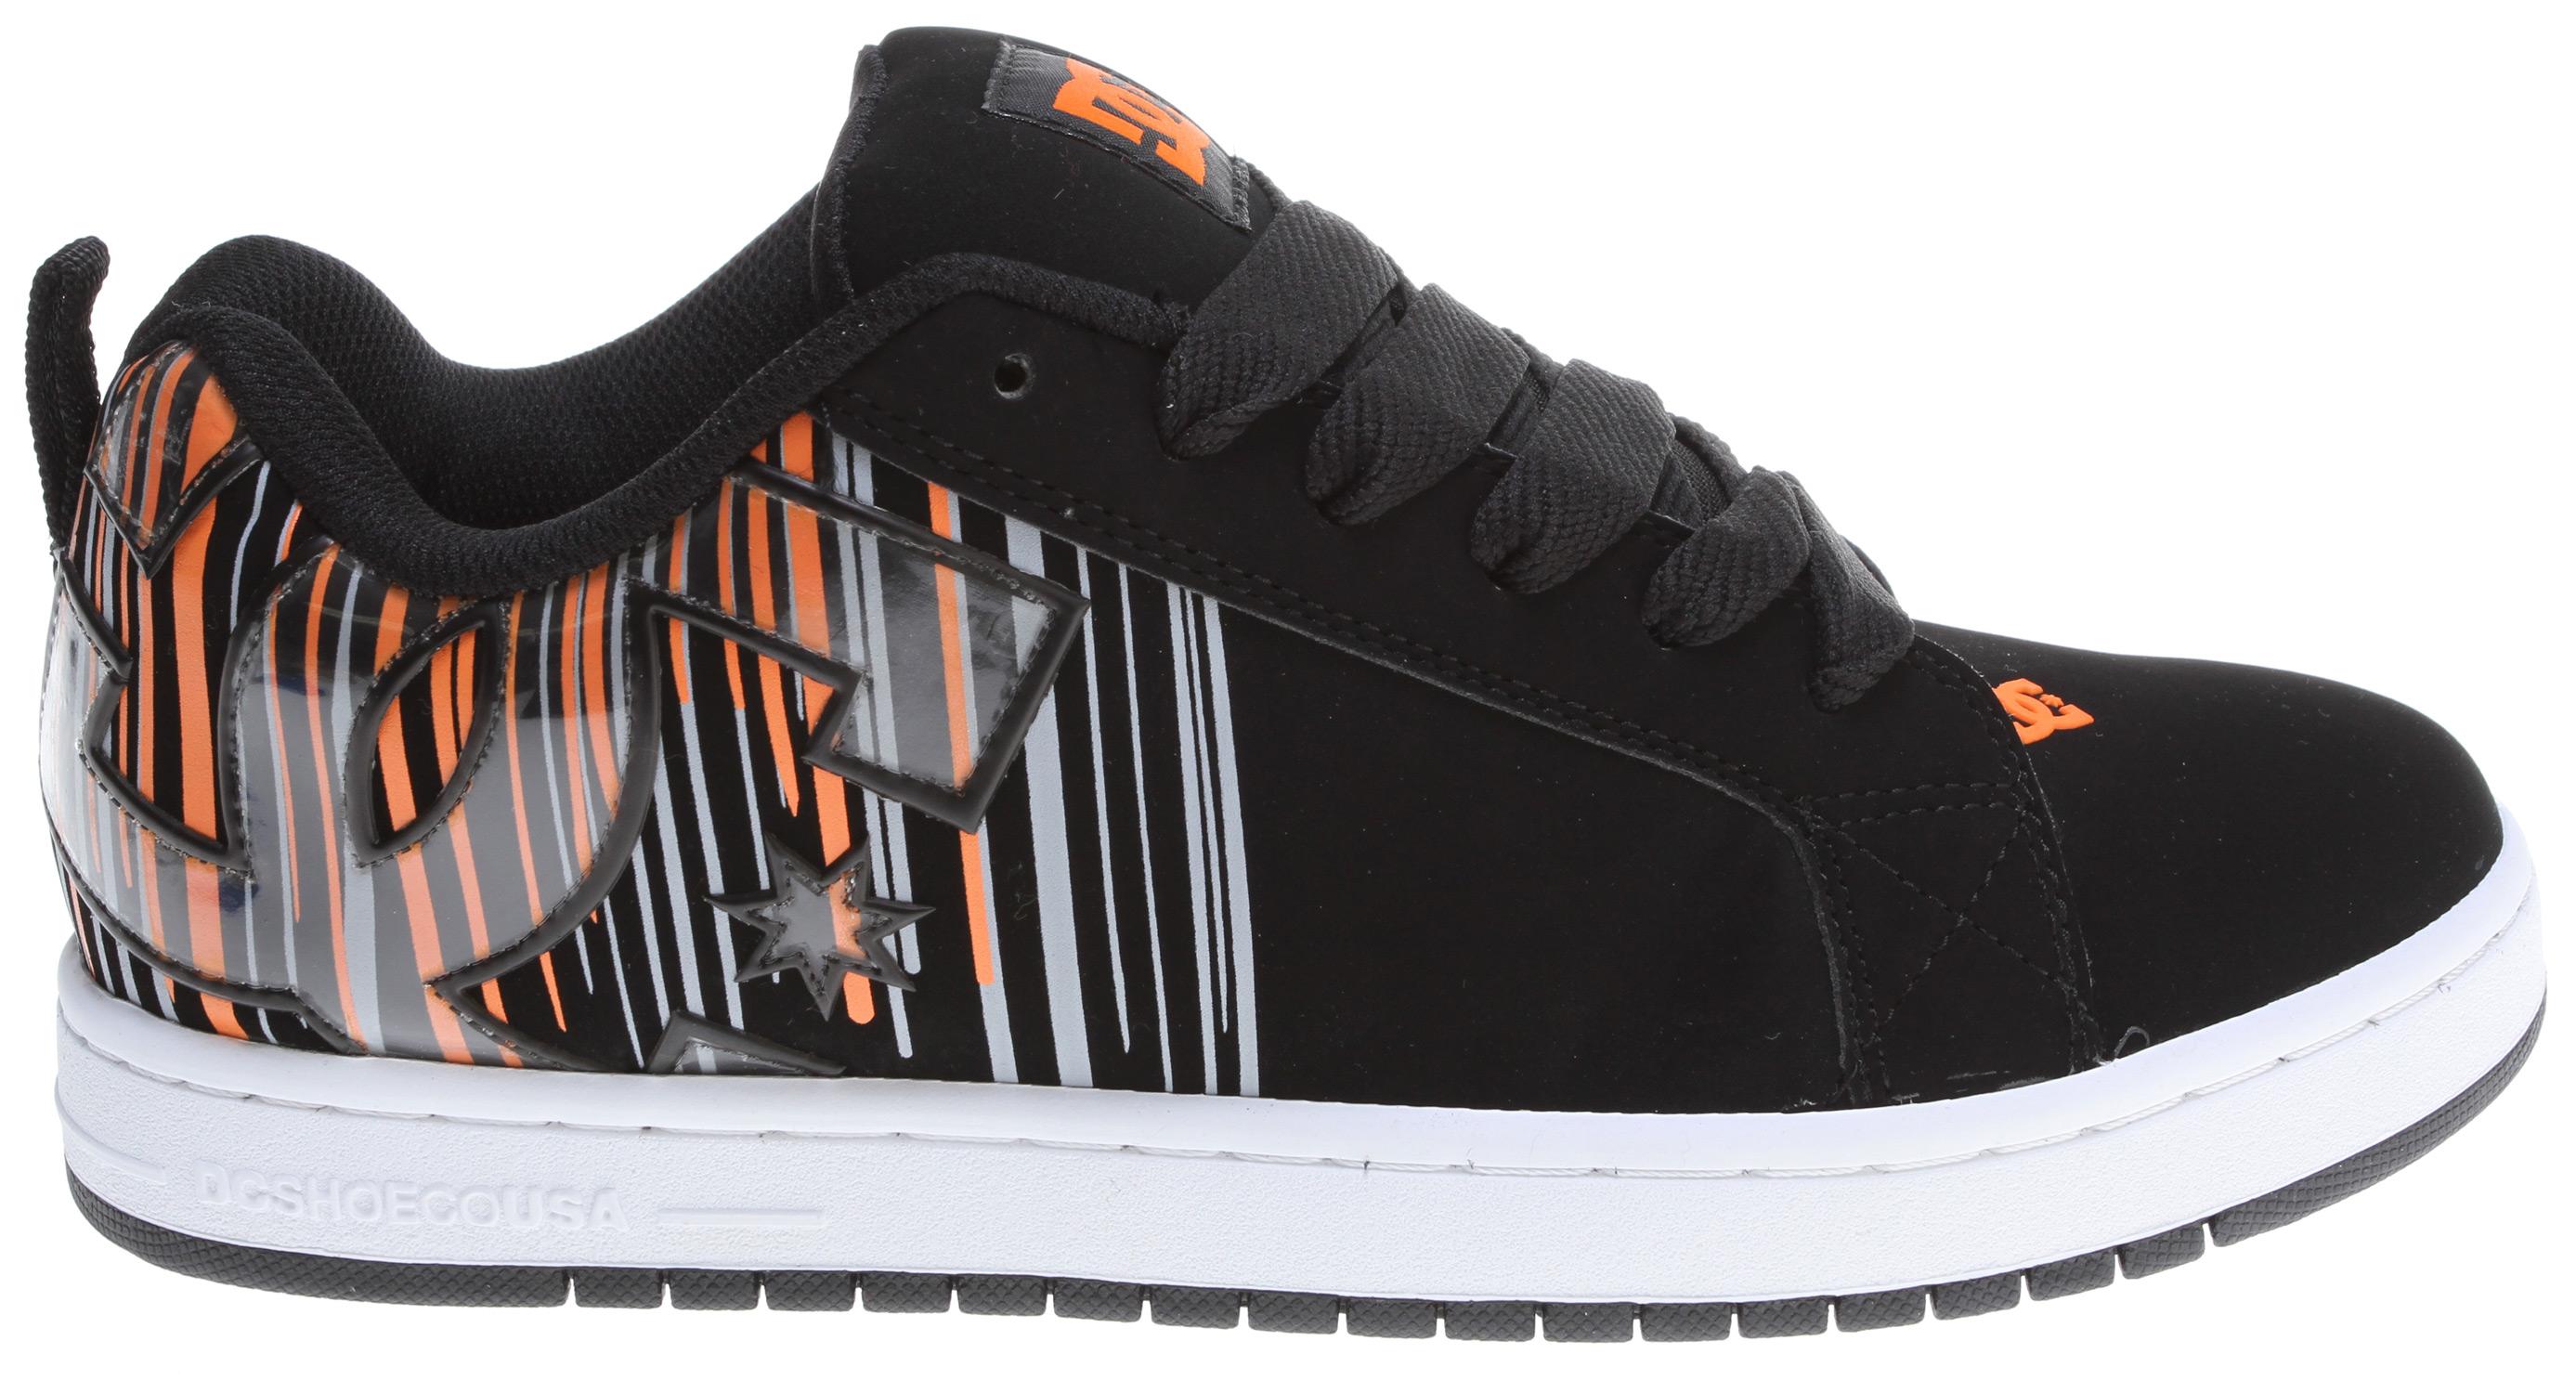 DC Men's Court Graffik SE Skate Shoe - Orange/Black - Size: 7 D